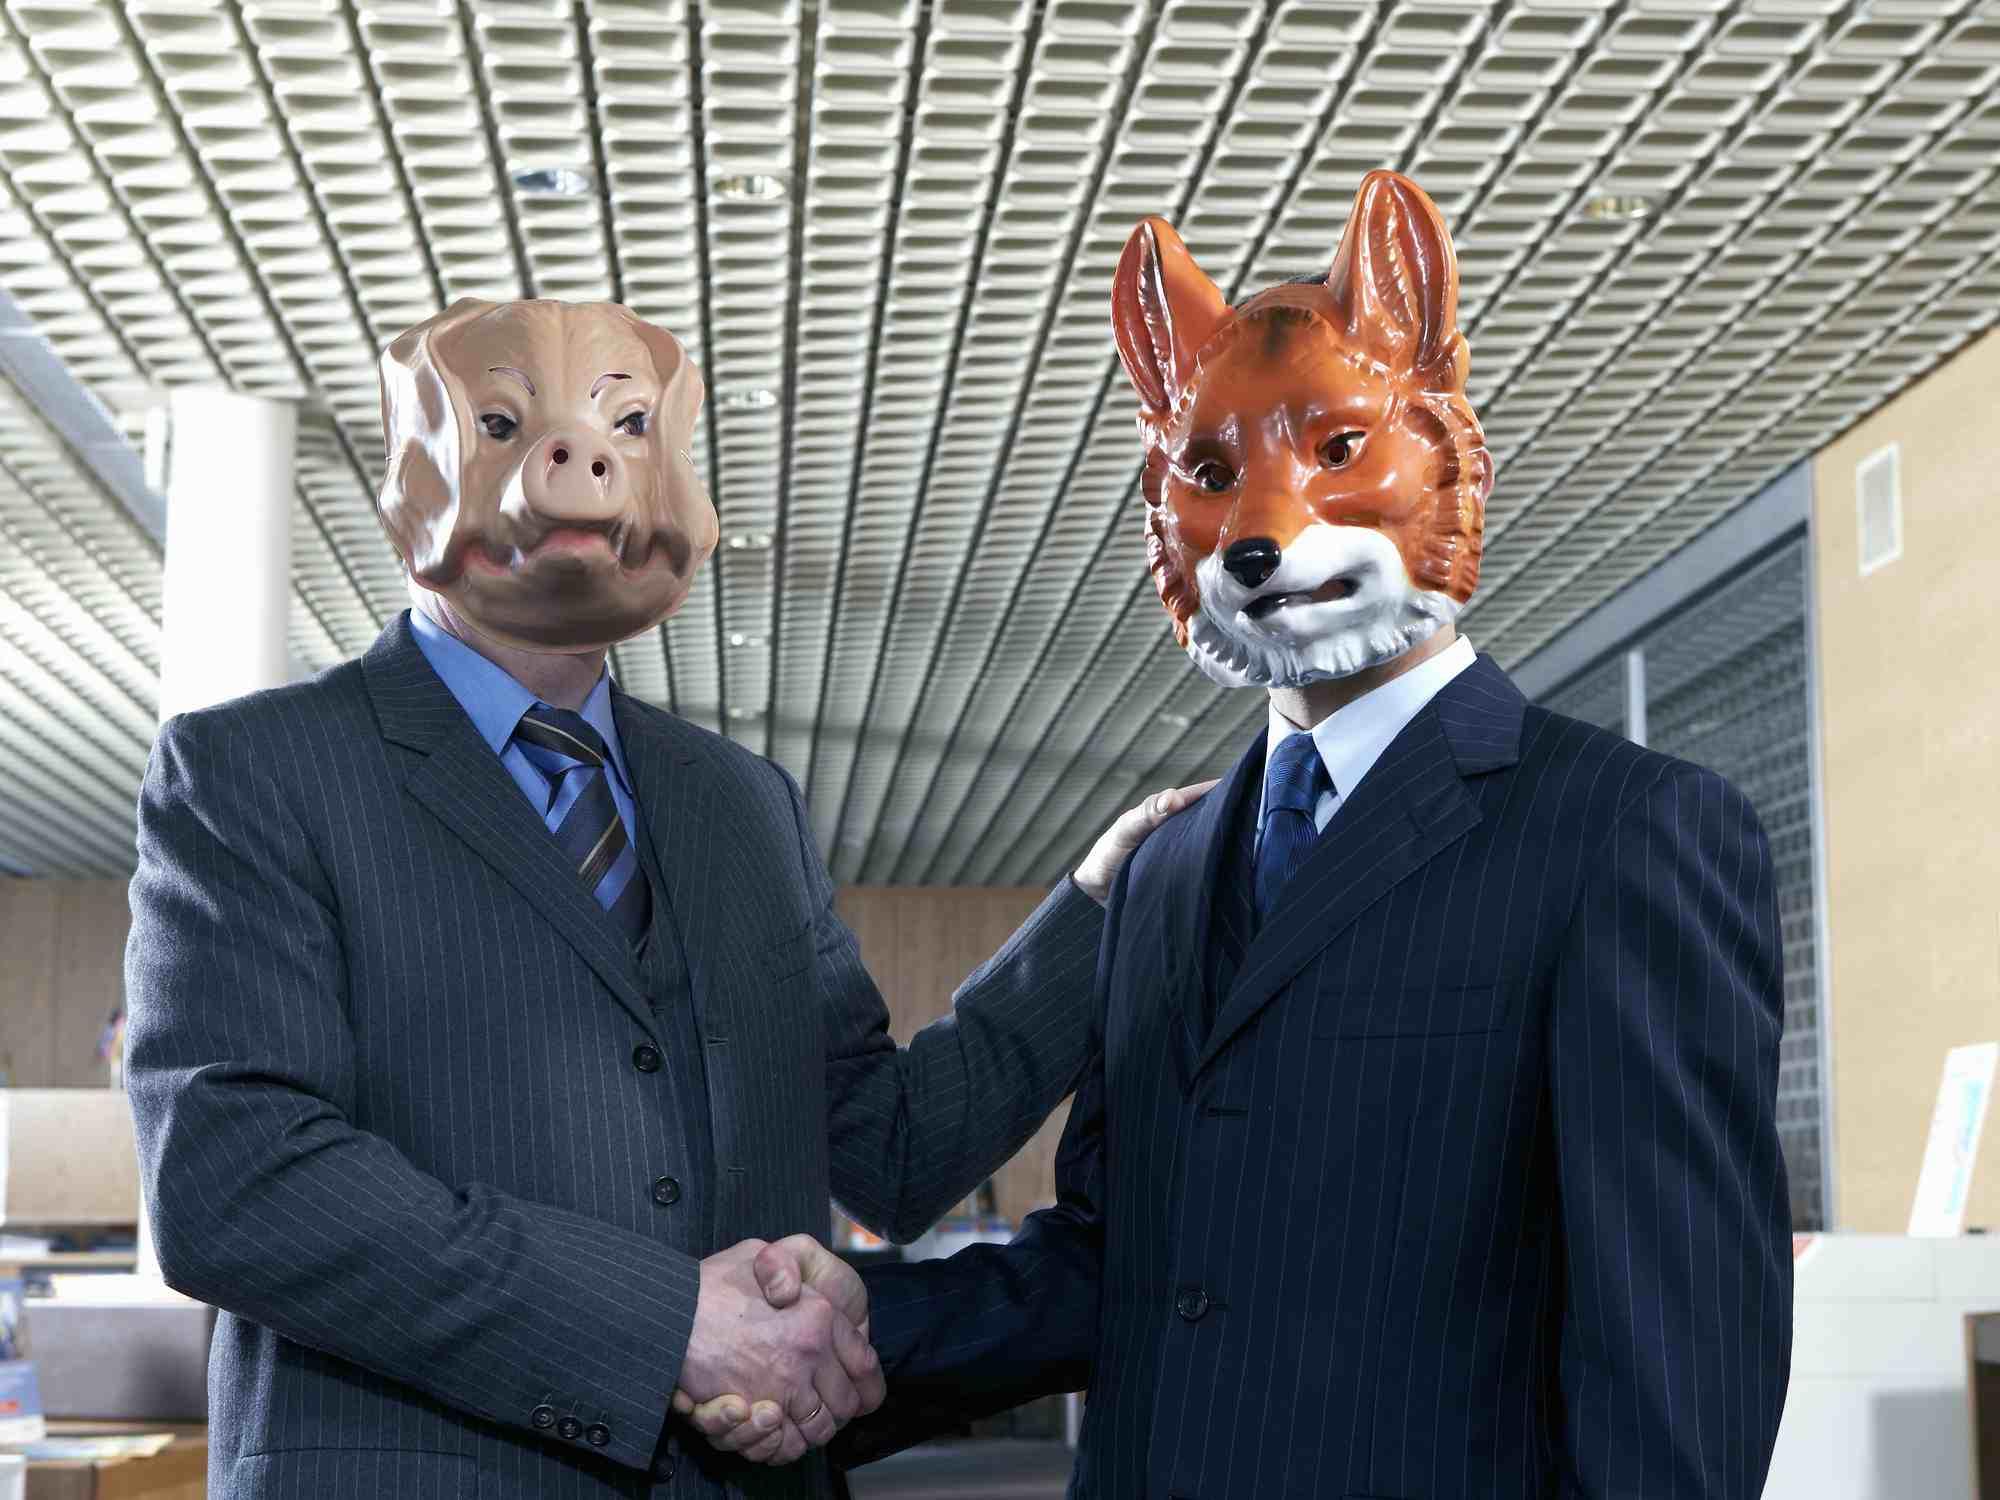 Businessmen shaking hands with animal masks